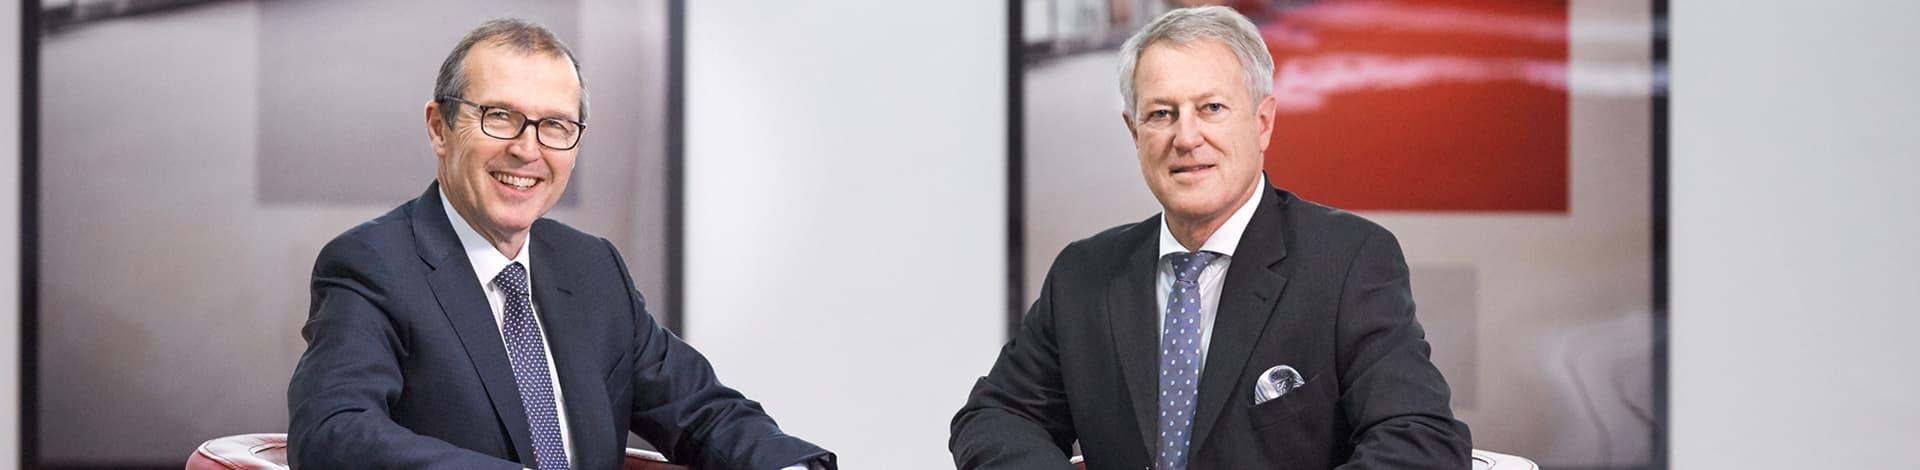 Markus Hongler, CEO; Urs Berger, président du Conseil d'administration